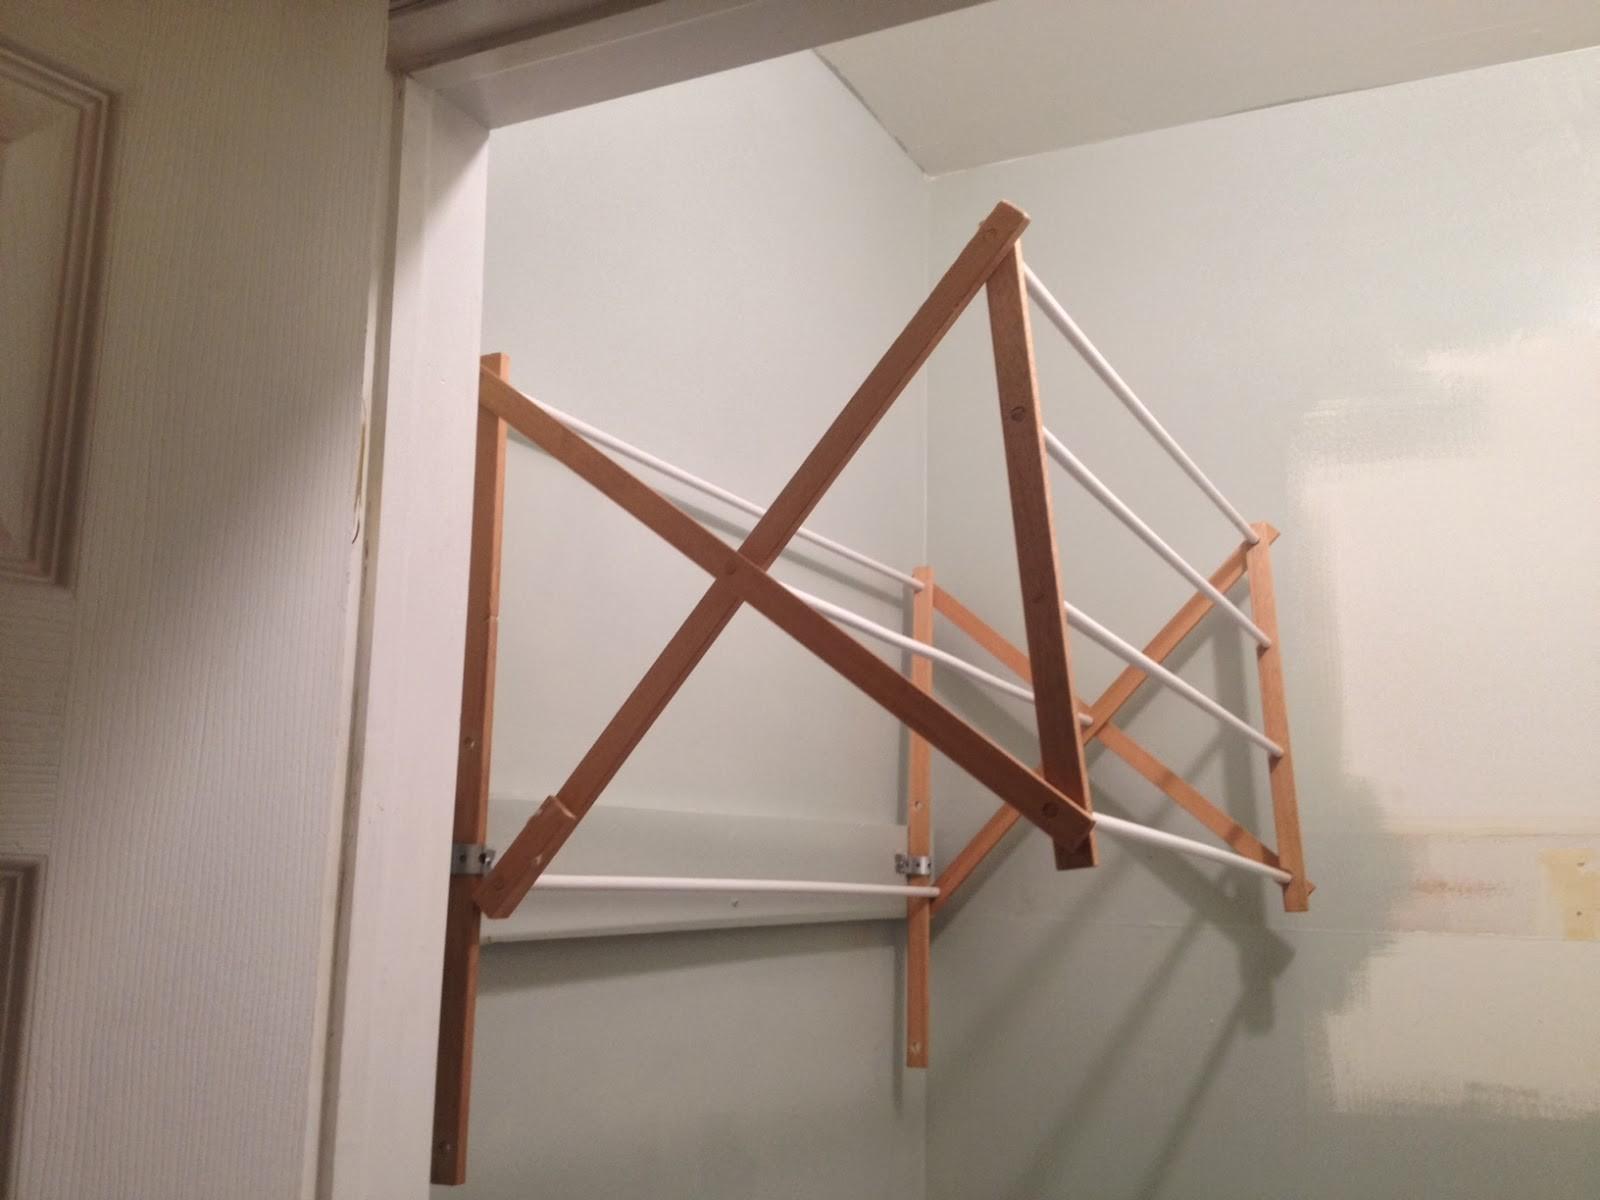 34 great diy laundry drying wall rack